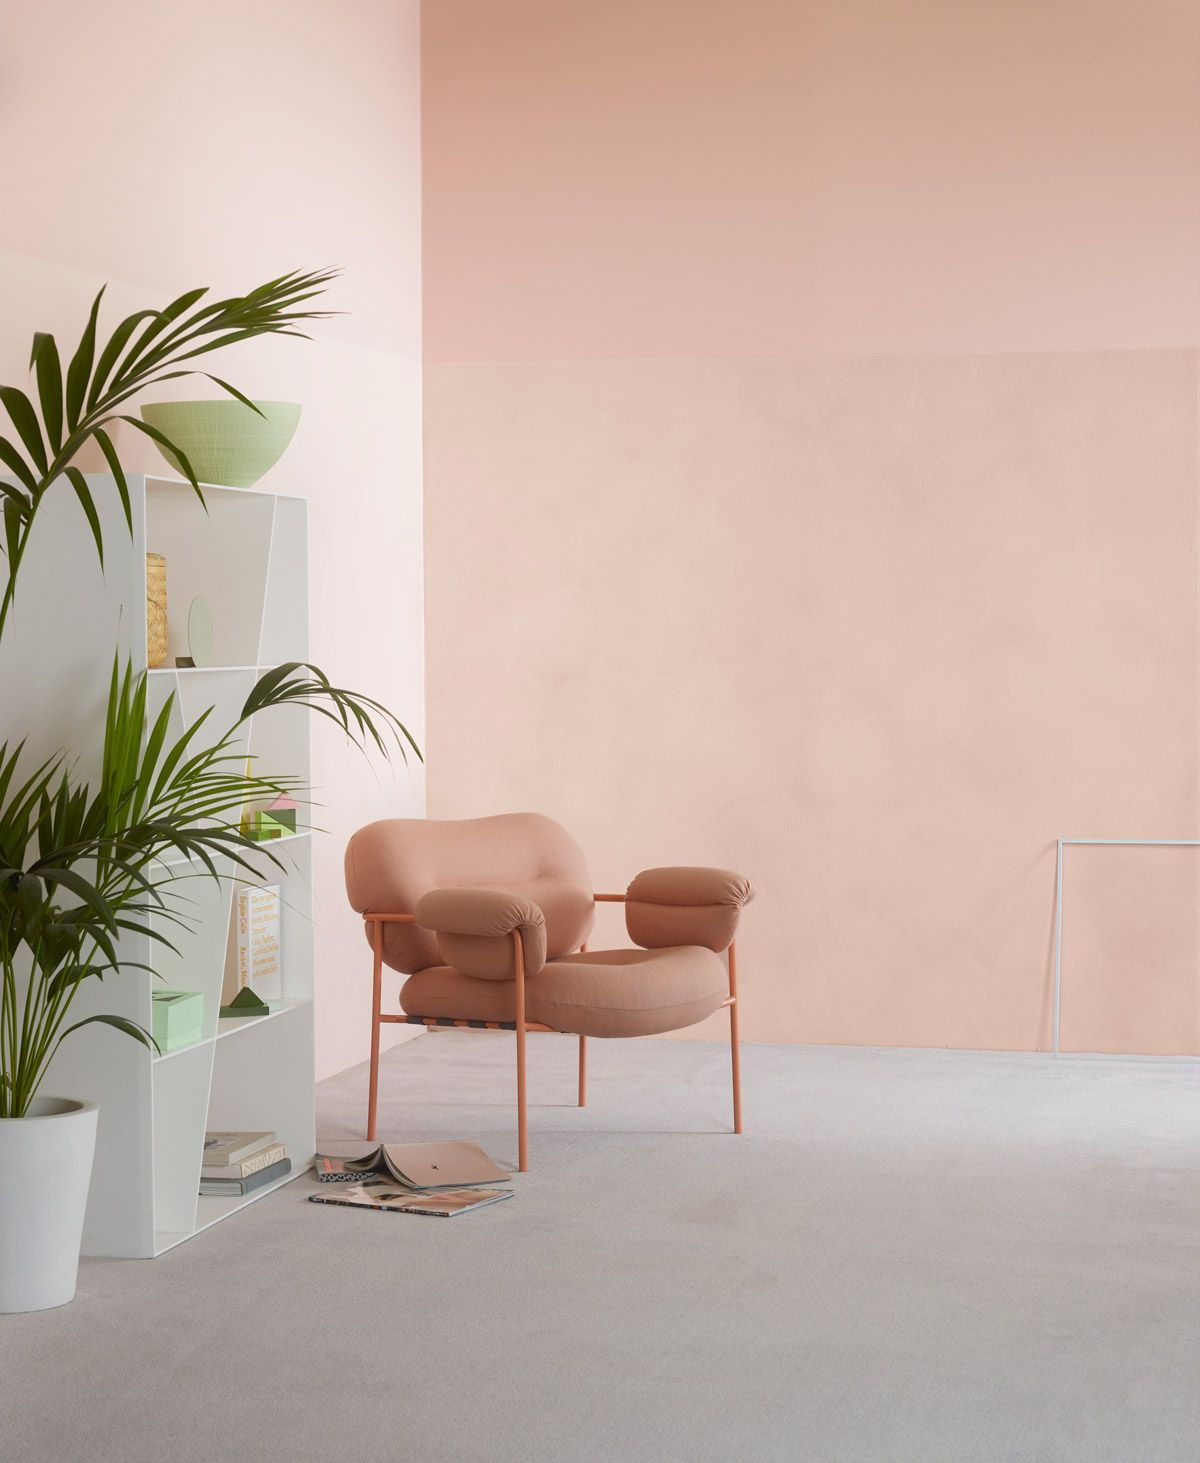 Modern Bedroom Wall Decor Ideas Bedroom Furniture Design 2016 Colours For Boy Bedroom Bedroom Decor Trends 2017: Wall: Fenomastic My Home Rich Matt 2782 Khajal